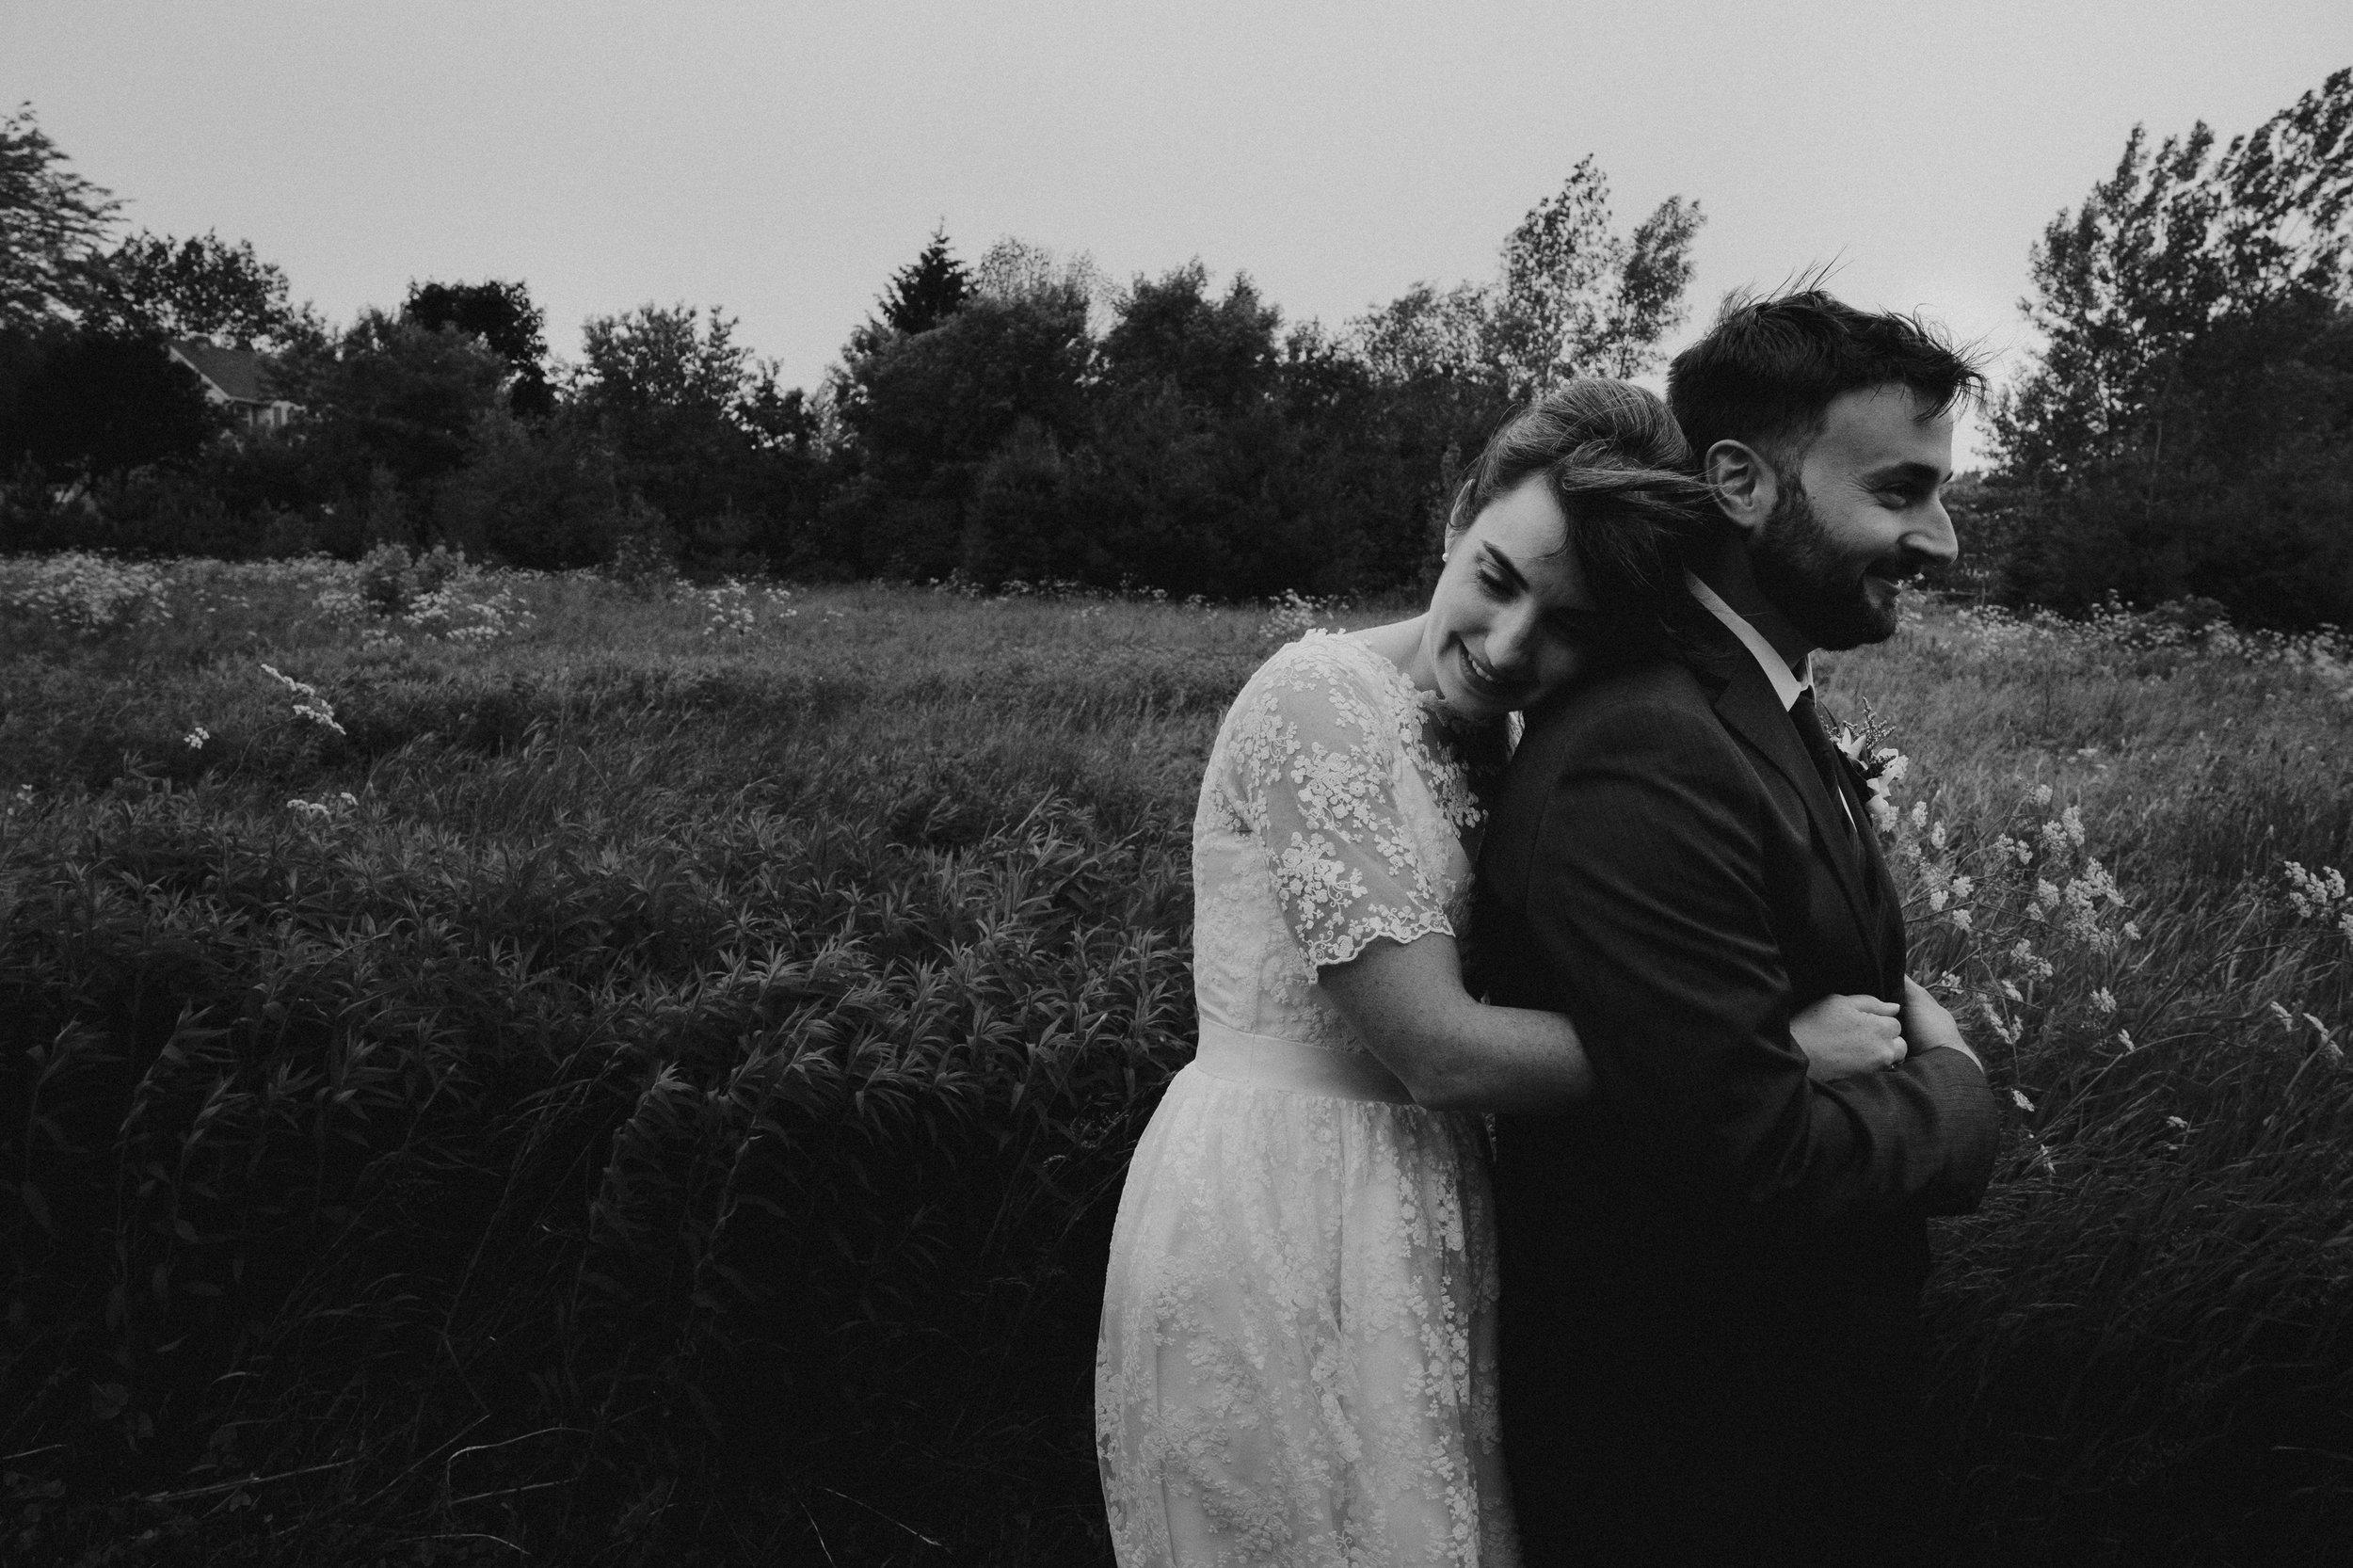 Otterburn+Wedding+Annabelle+Agnew+Photography+LR-100.jpg